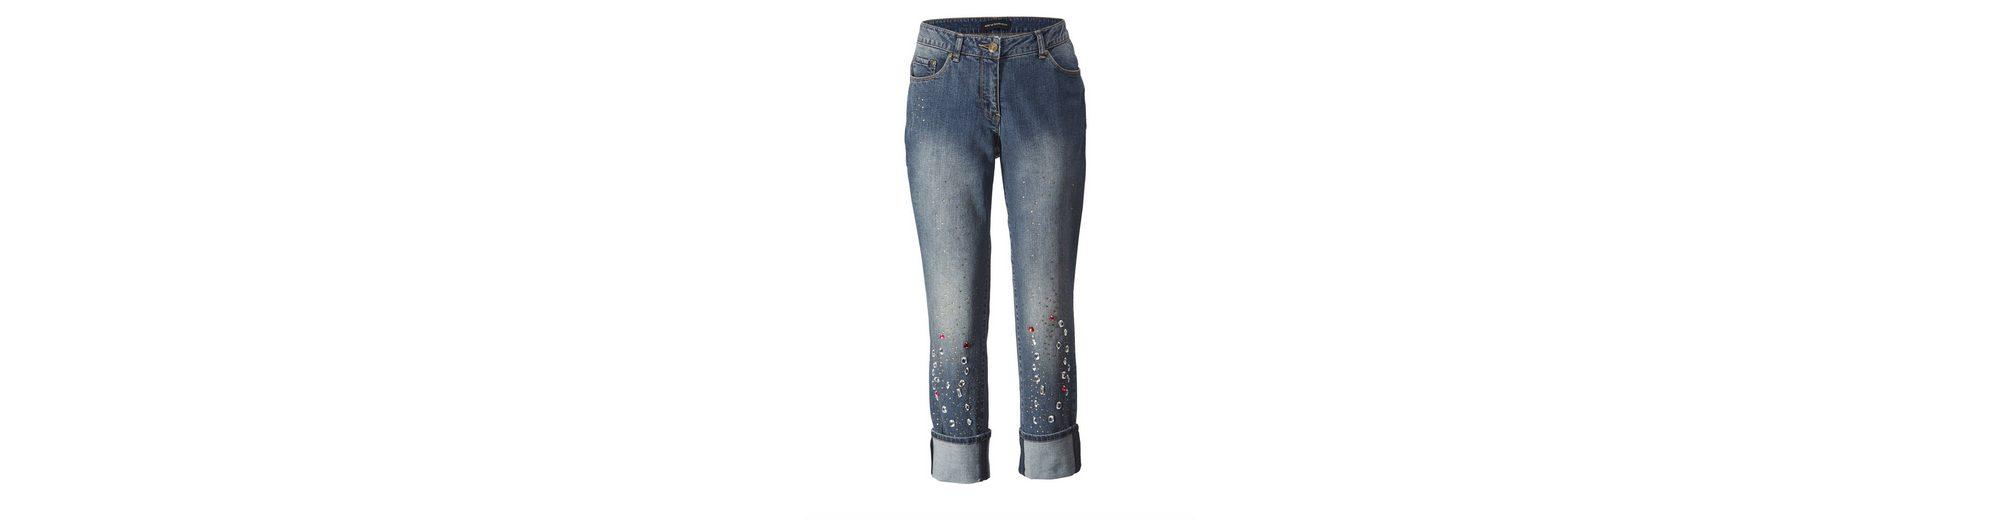 Sara Lindholm by Happy Size Jeans knöchellang mit Strass 2018 Unisex rJehK12j